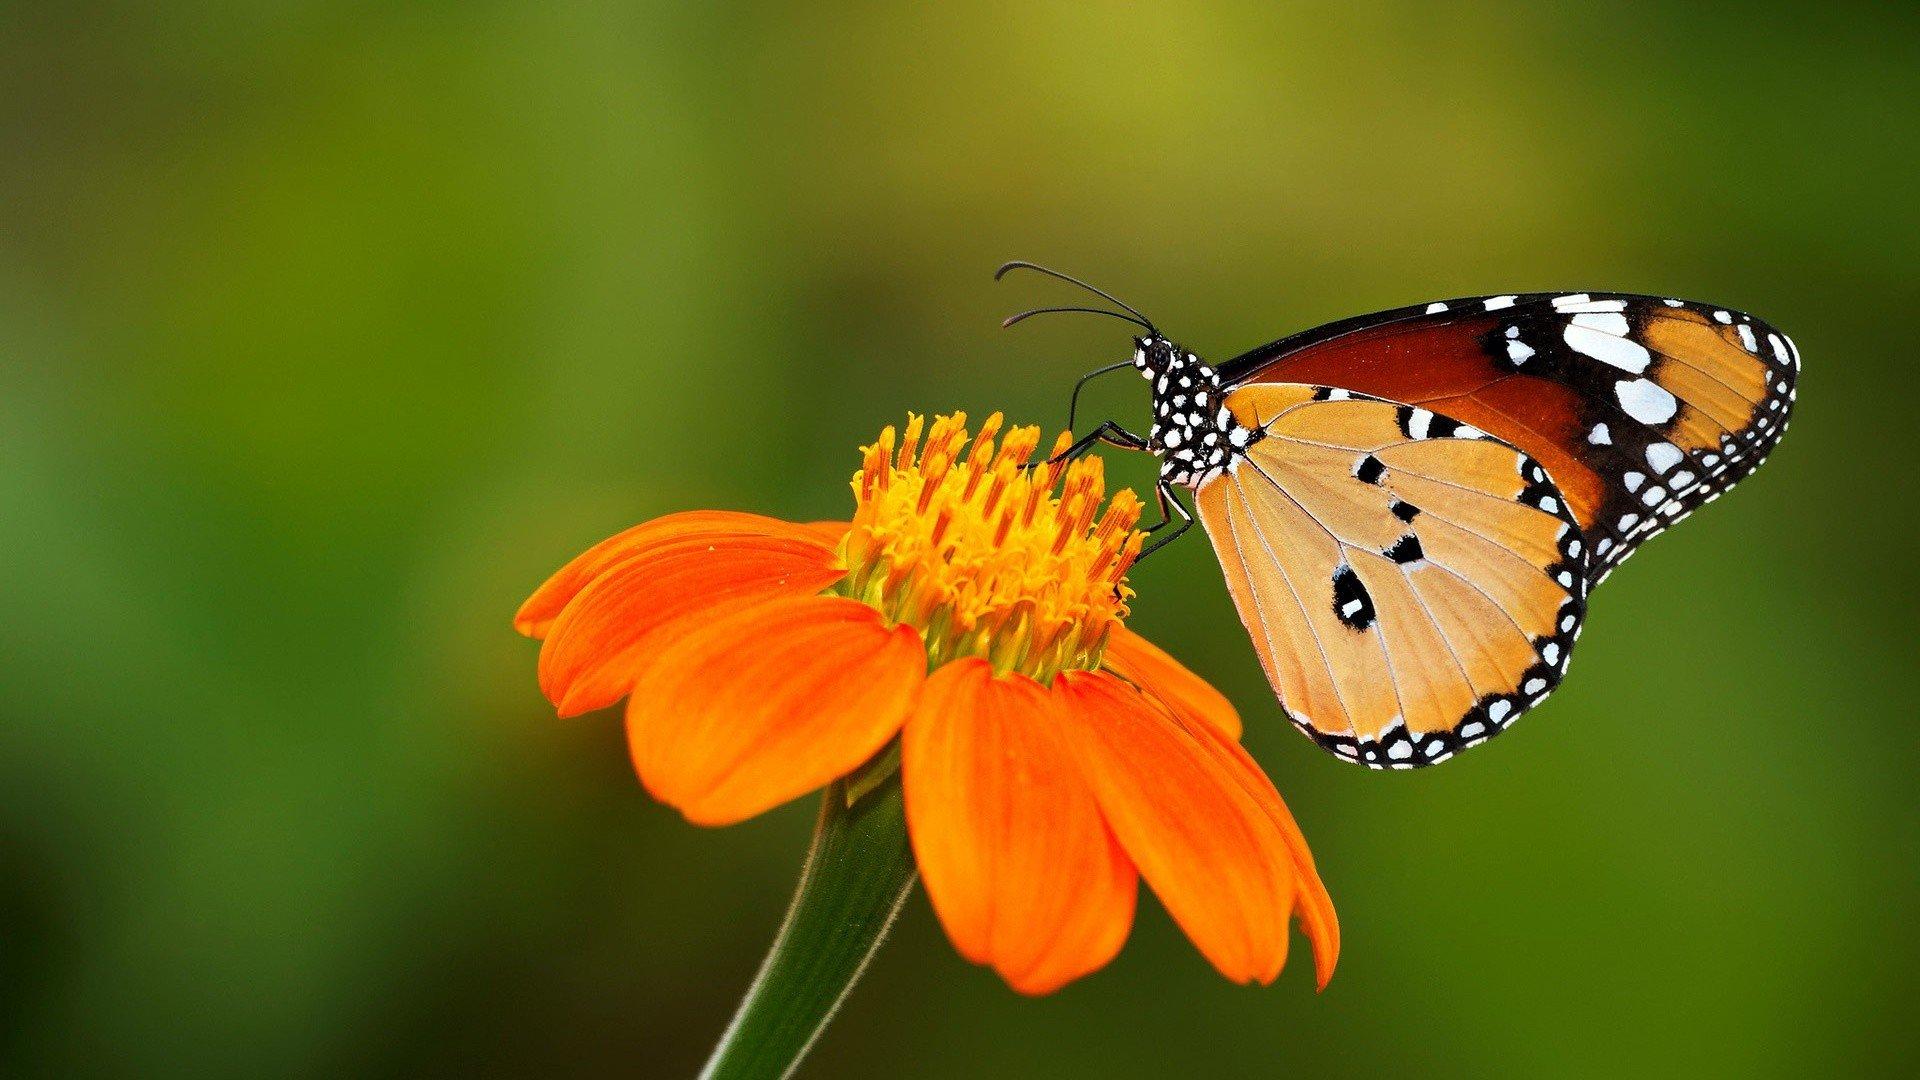 [44+] Butterflies and Flowers Wallpaper on WallpaperSafari